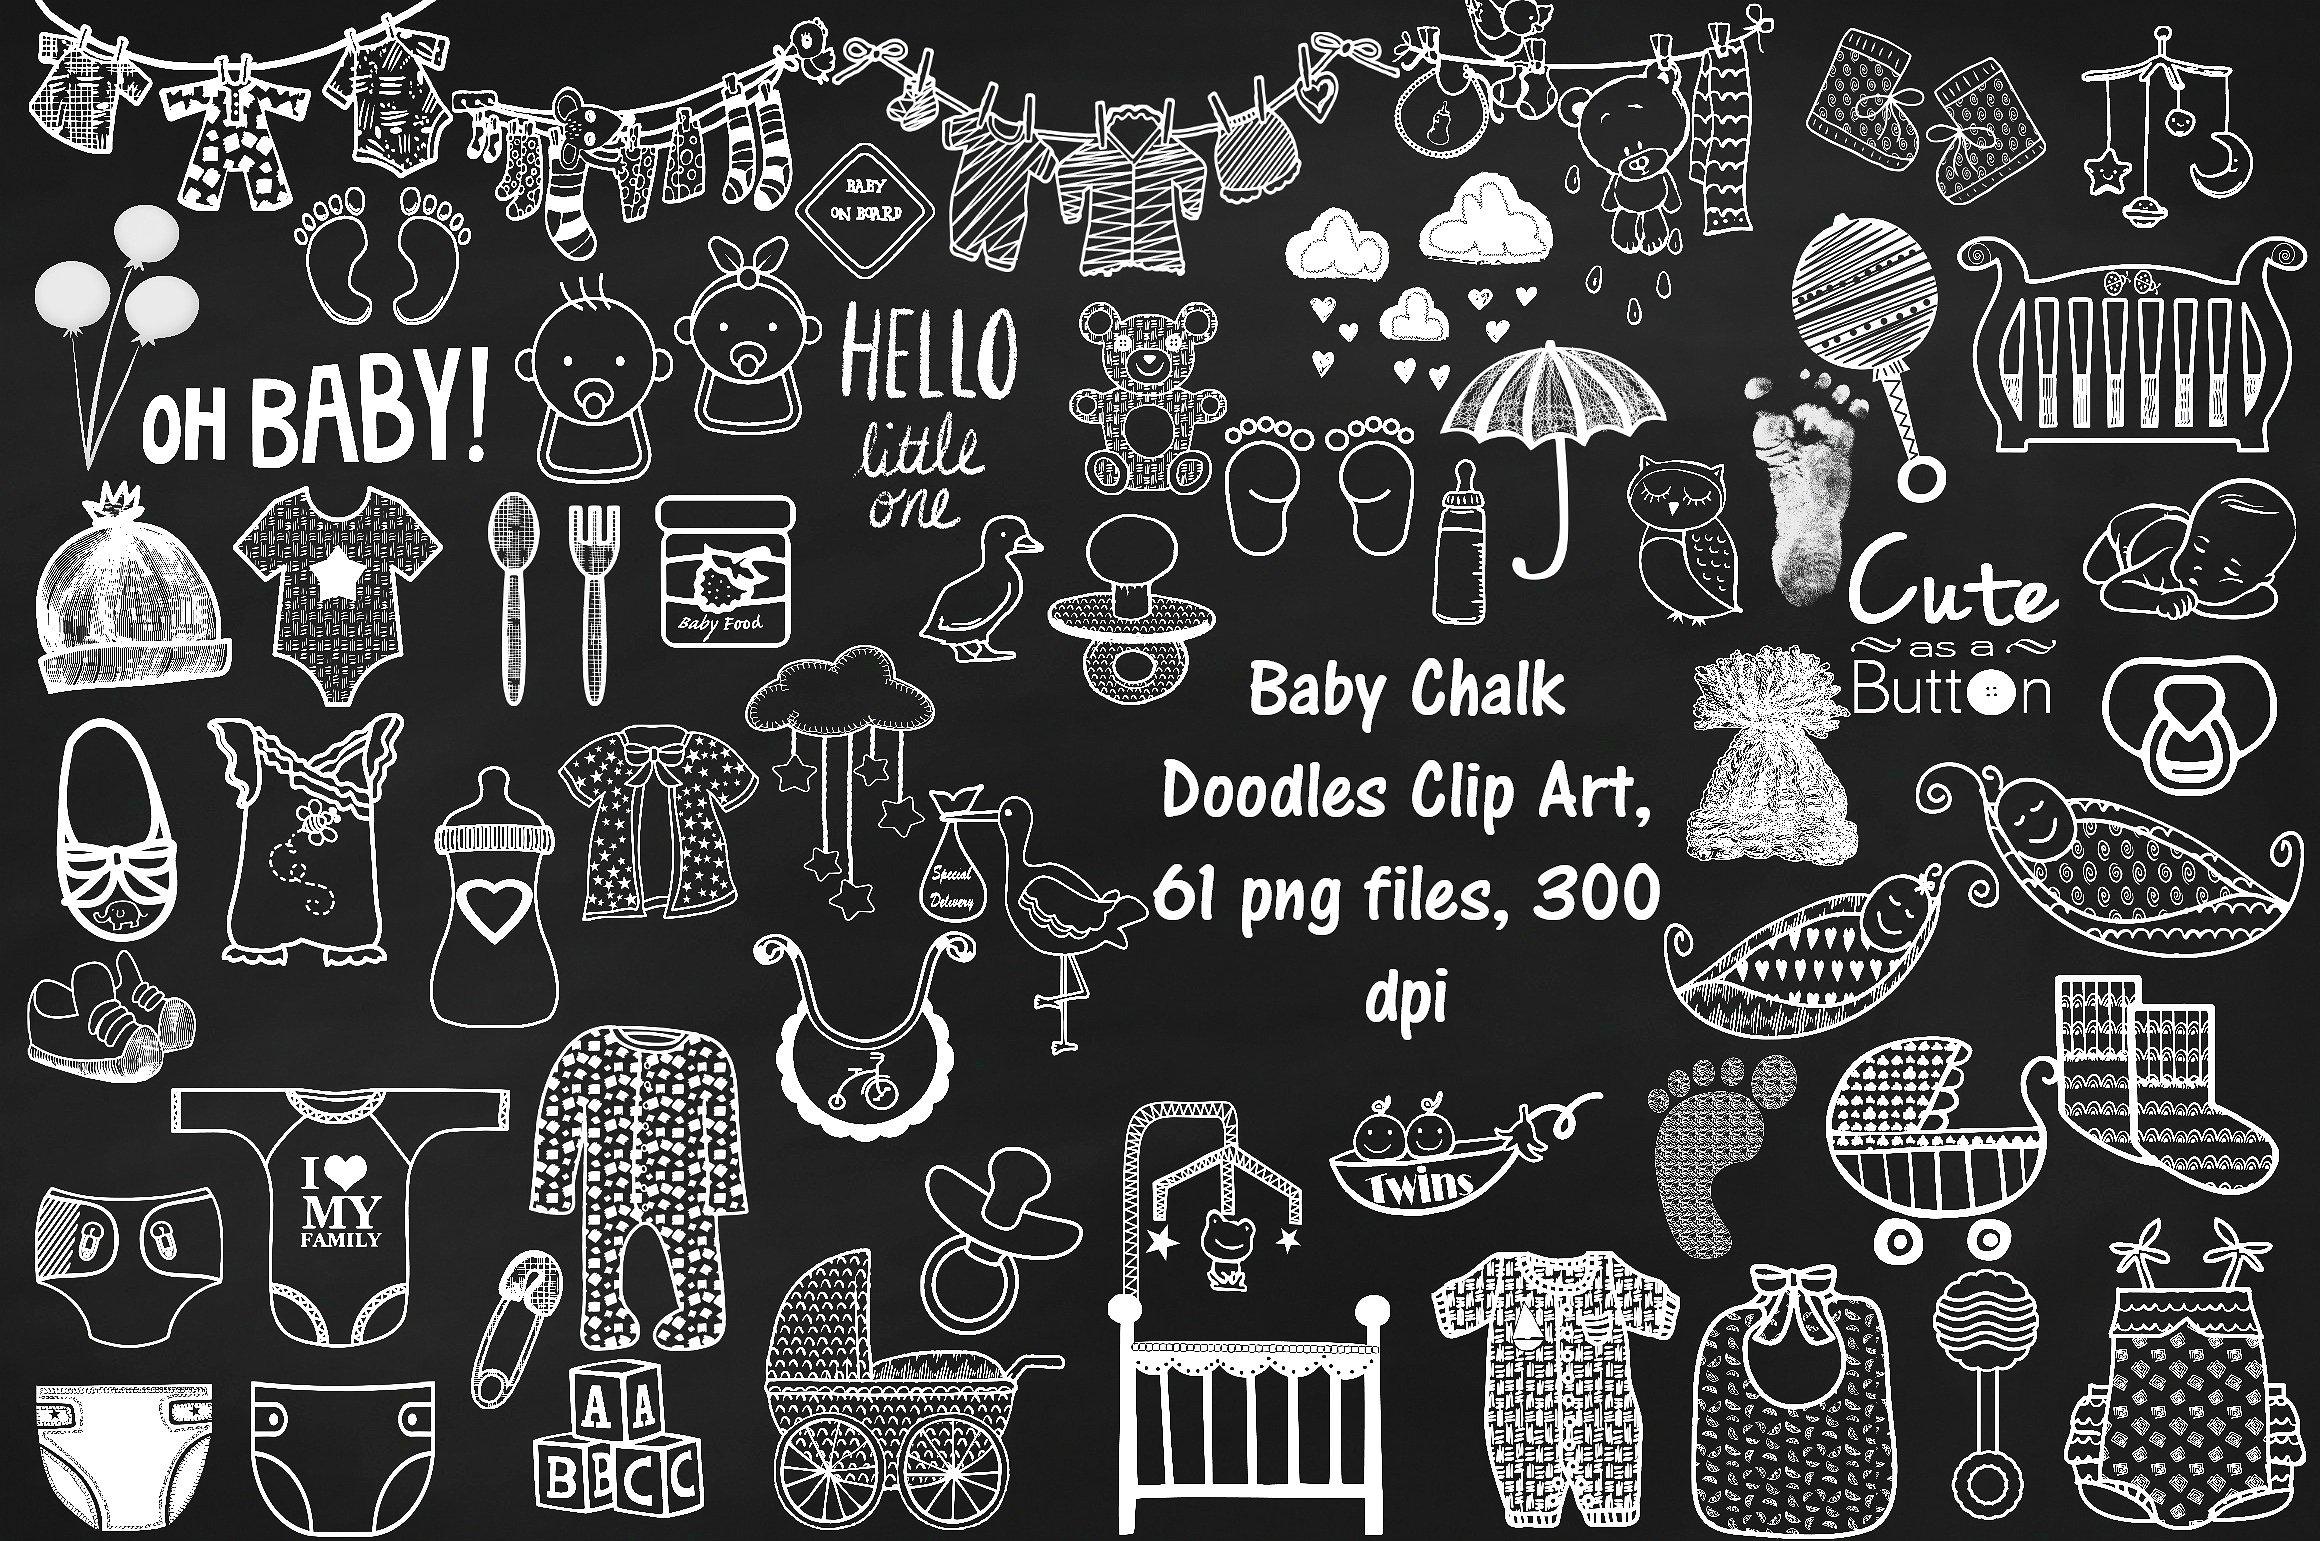 Chalk clipart doodle. Baby doodles png illustrations